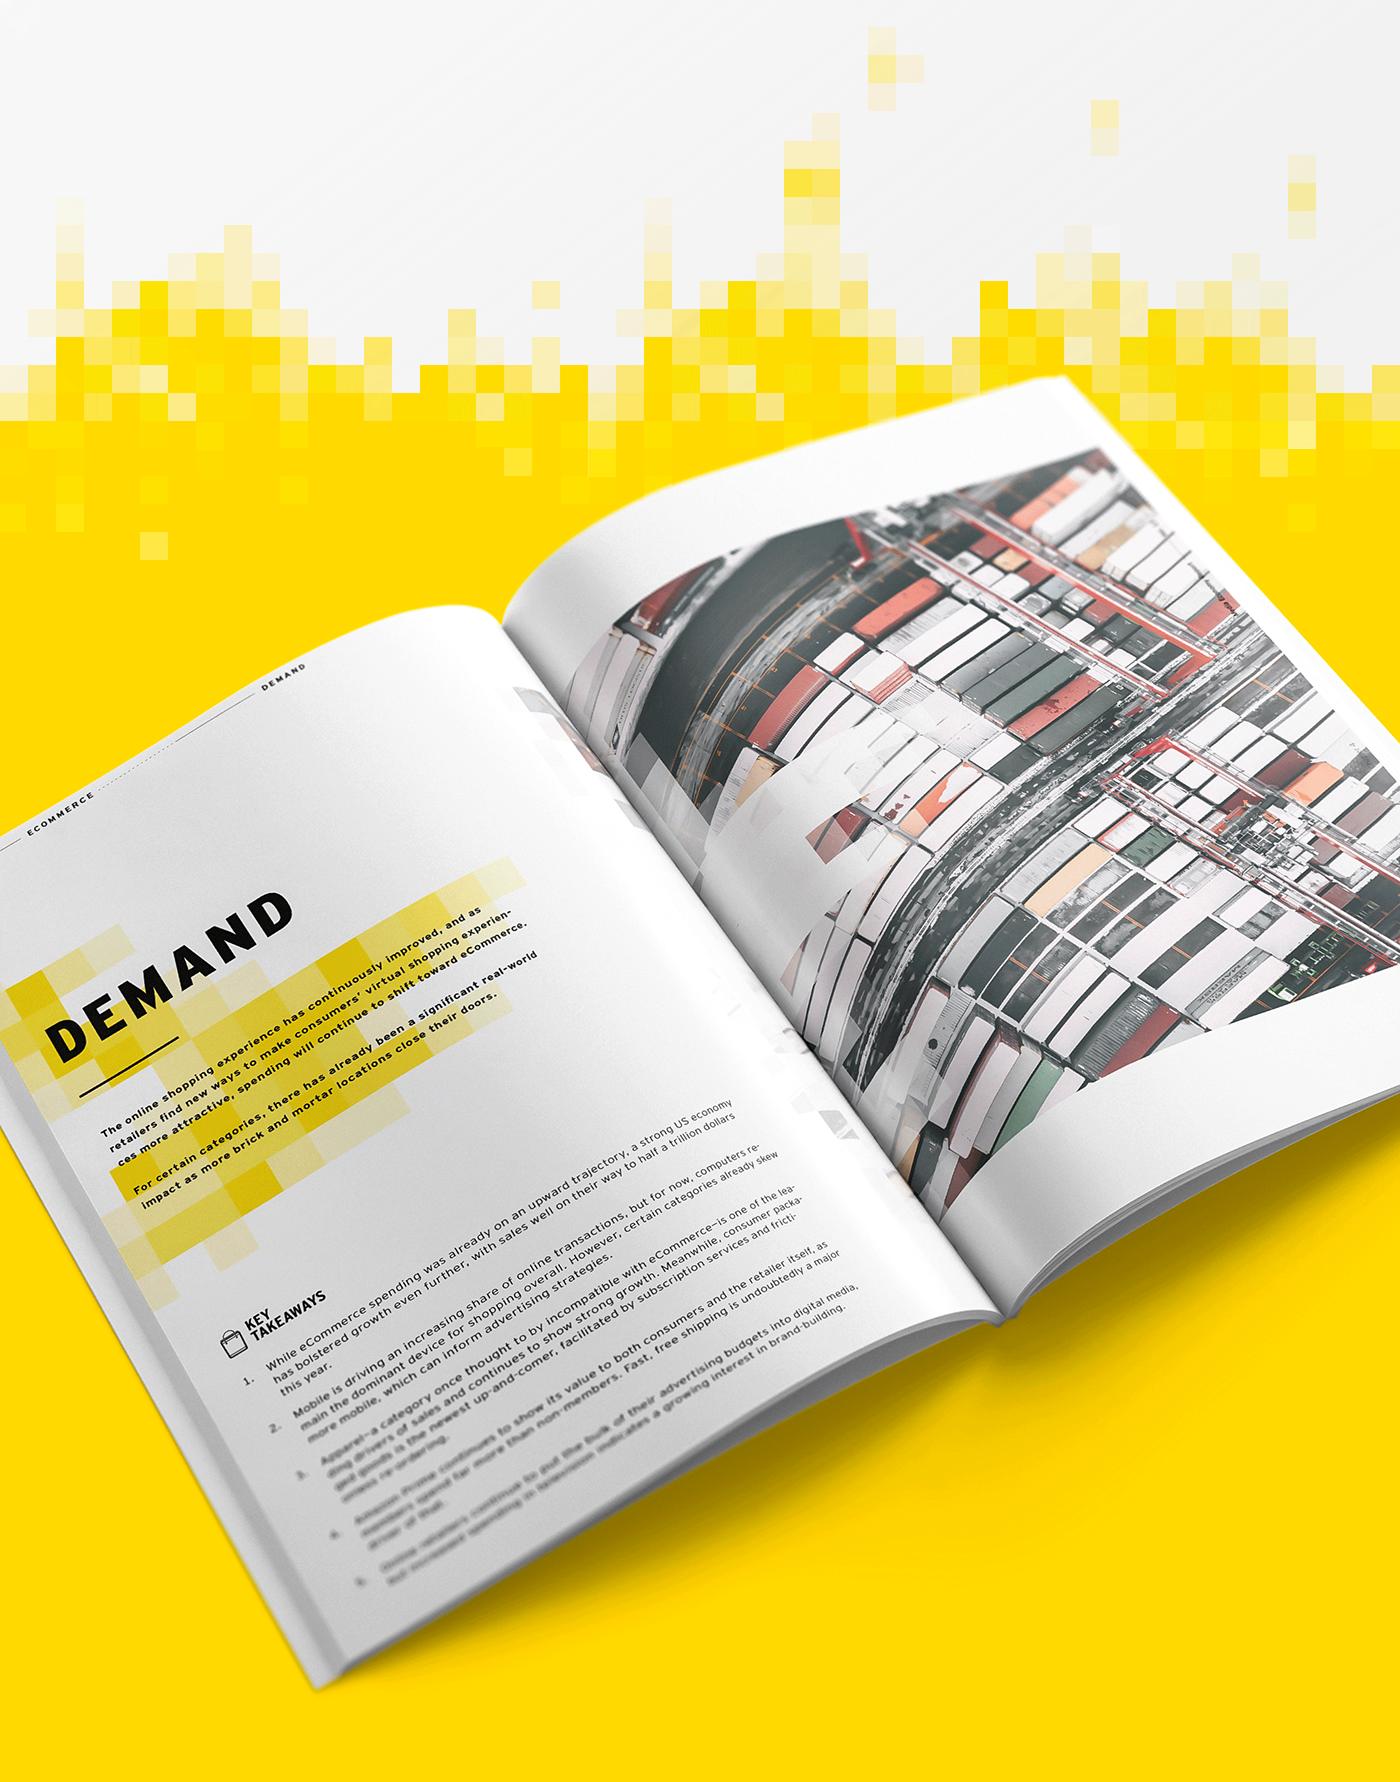 graphic design  ILLUSTRATION  information architecture  information design infographics dataviz data visualization magazine editorial design  AnnualReport